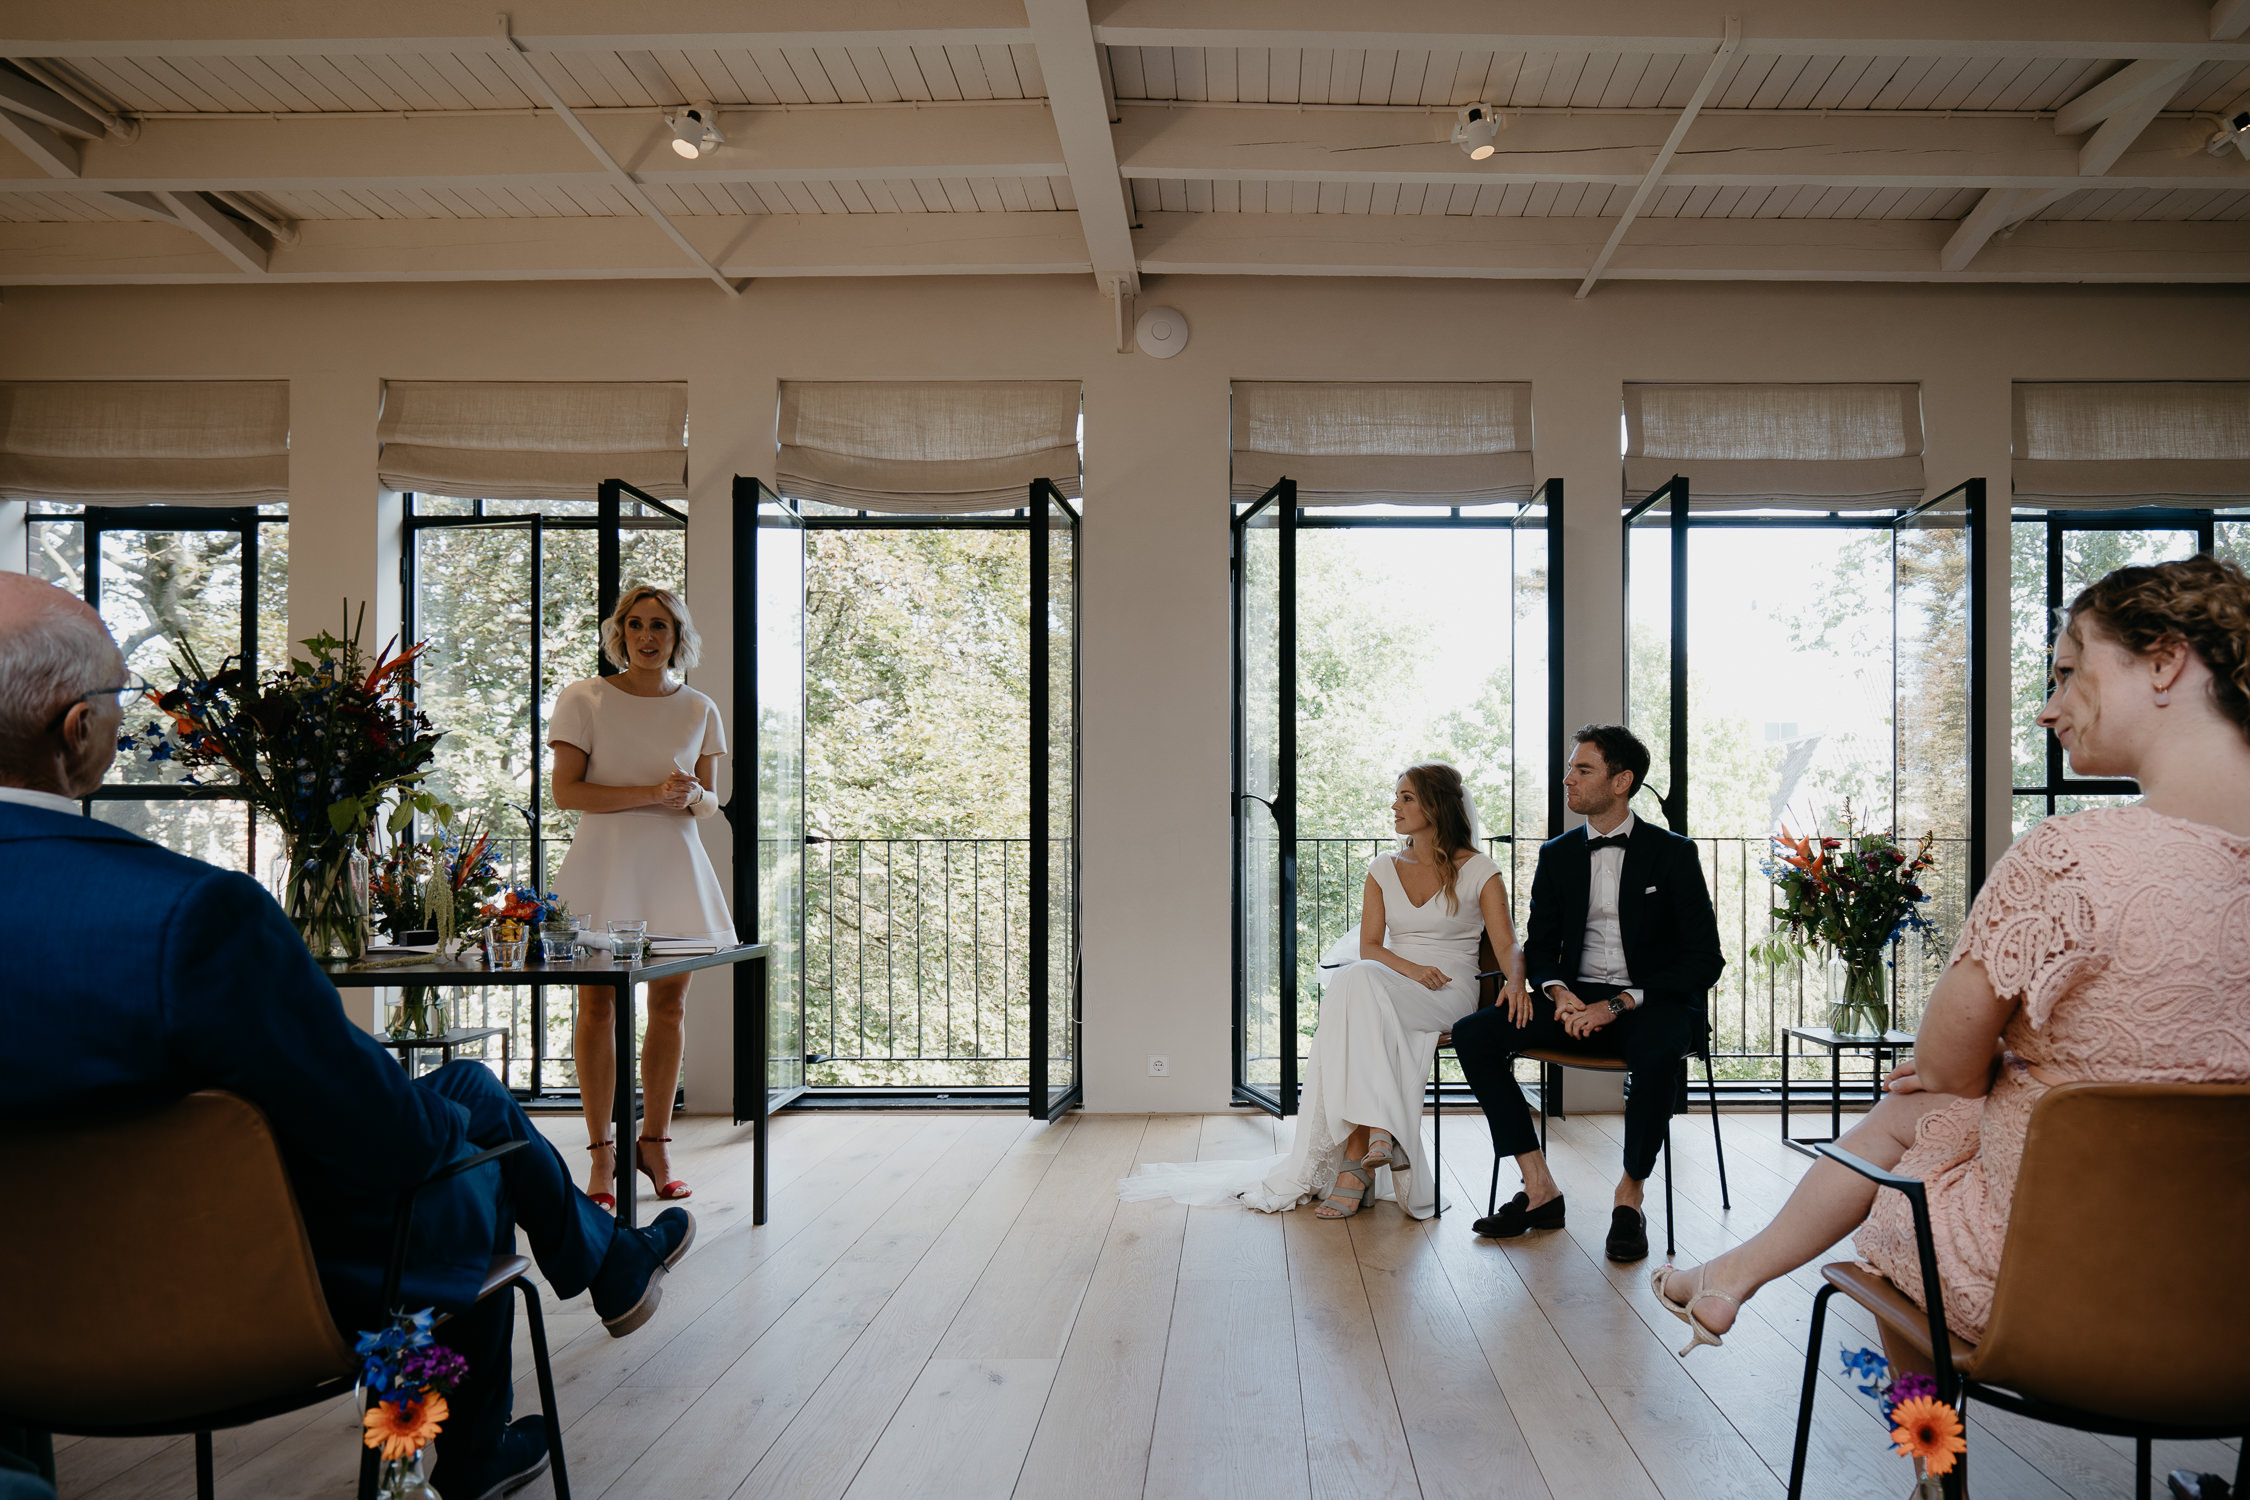 wedding ceremony in lovely venue in Amsterdam